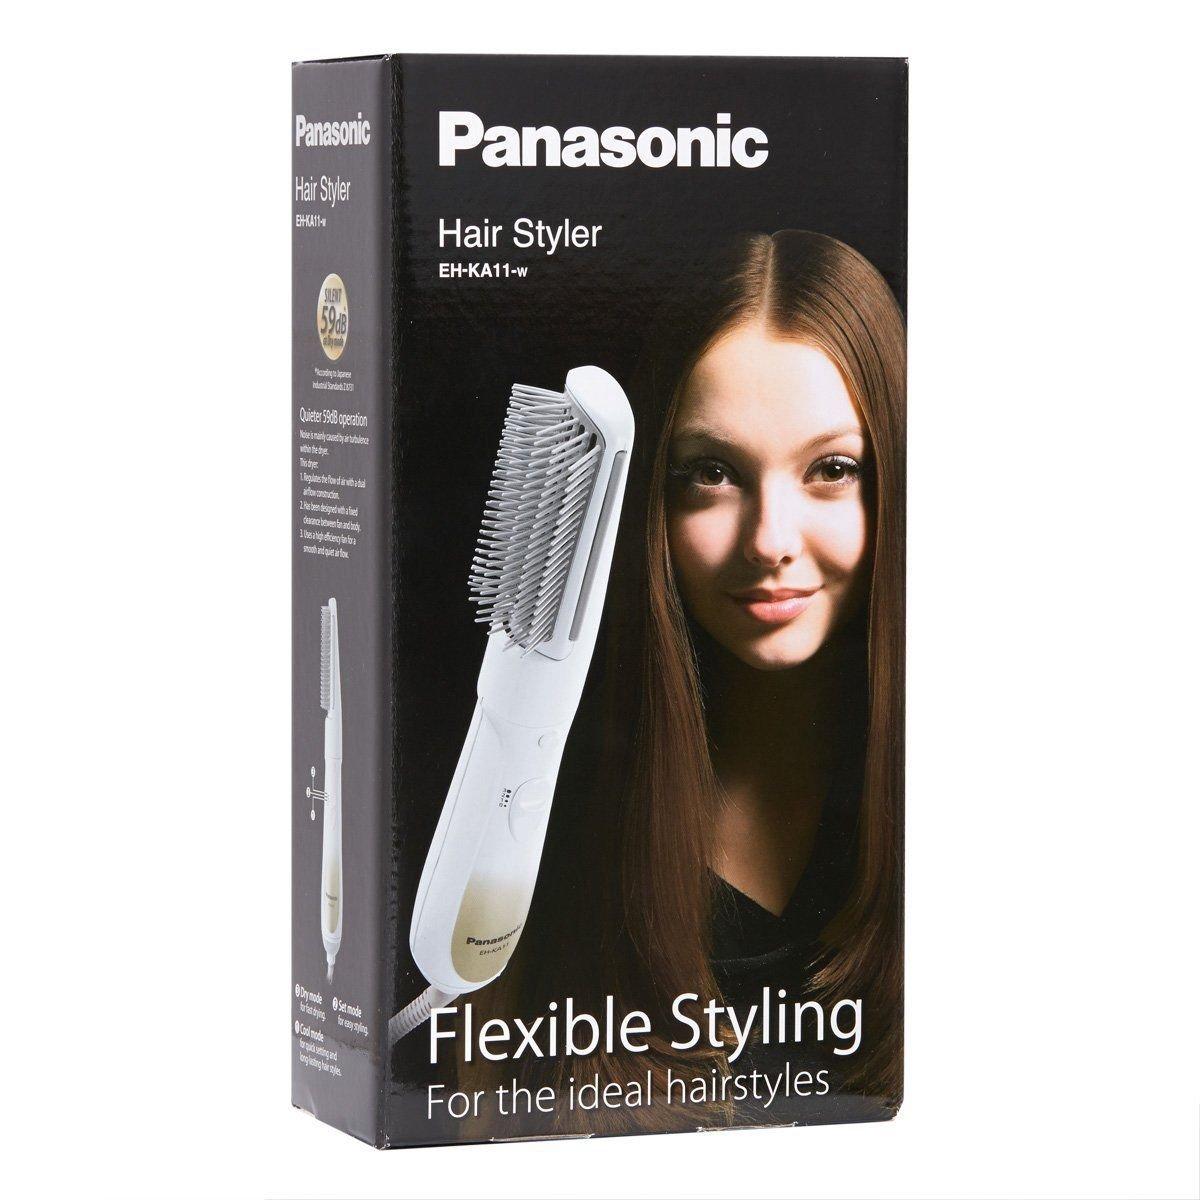 PANASONIC EH-KA11 Blow Brush dryer/Electric Hair Styler Irons UK